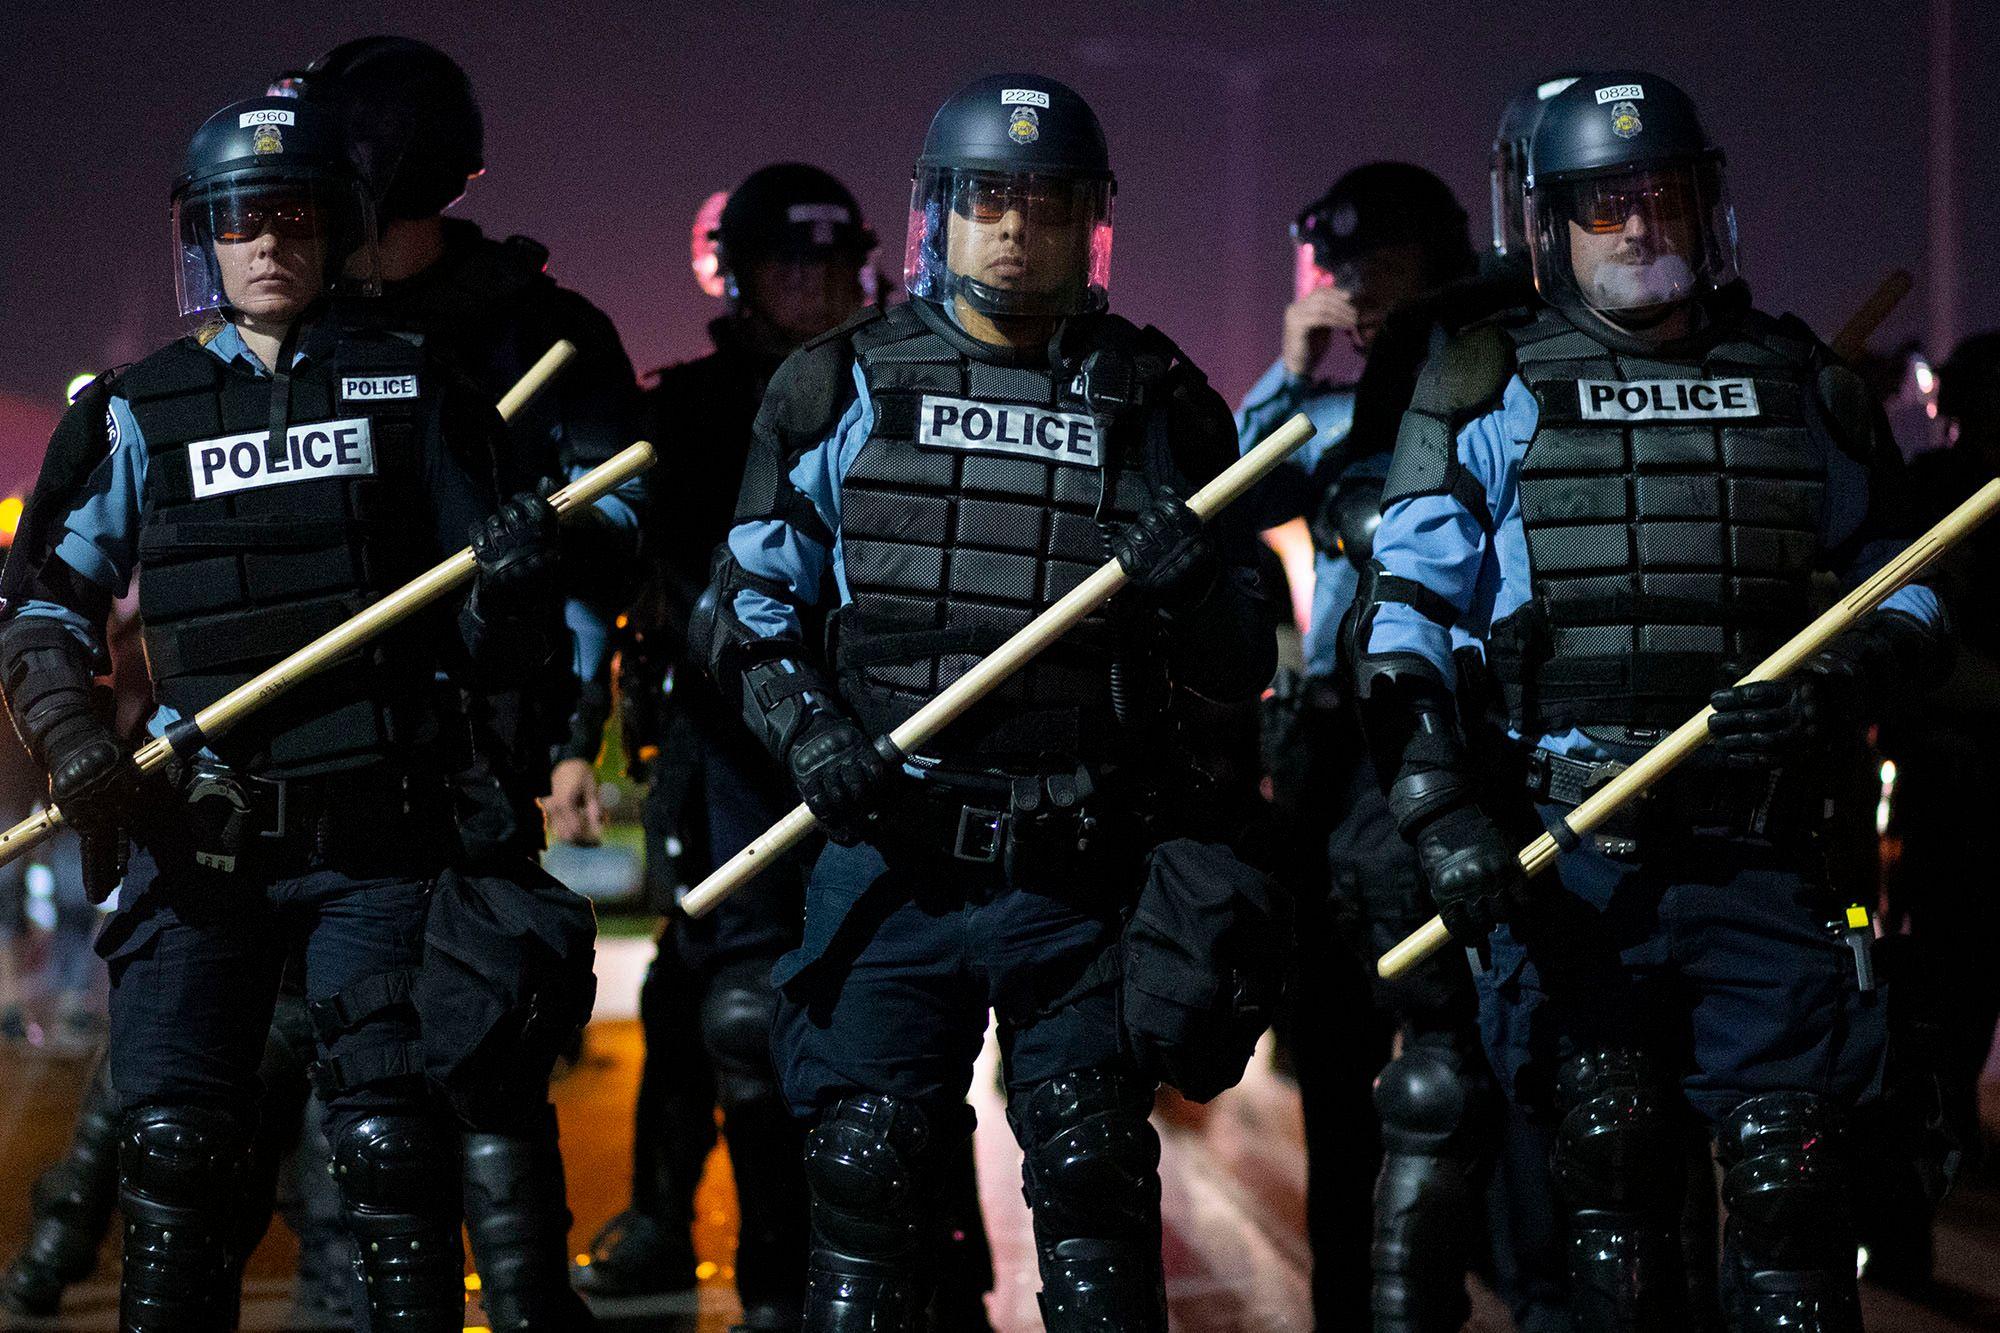 duties of Police in general